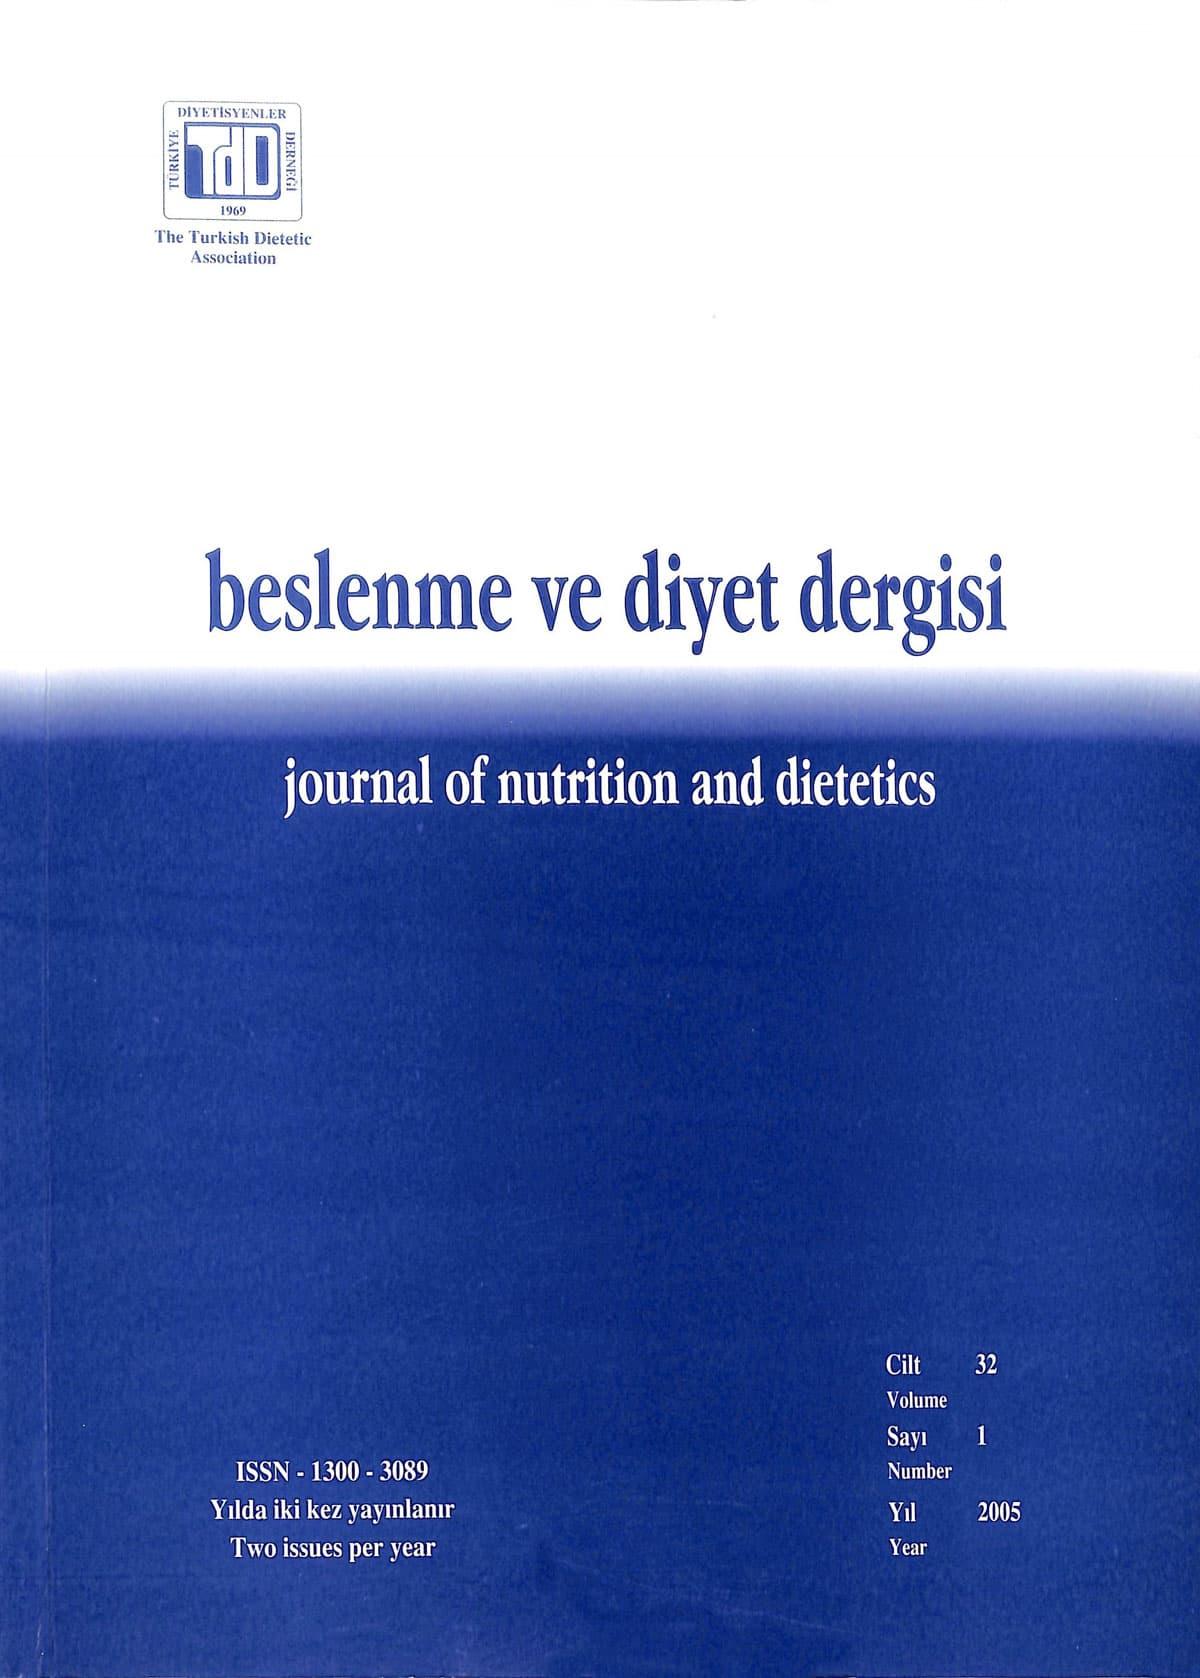 Cilt 33 Sayı 1 (2005)